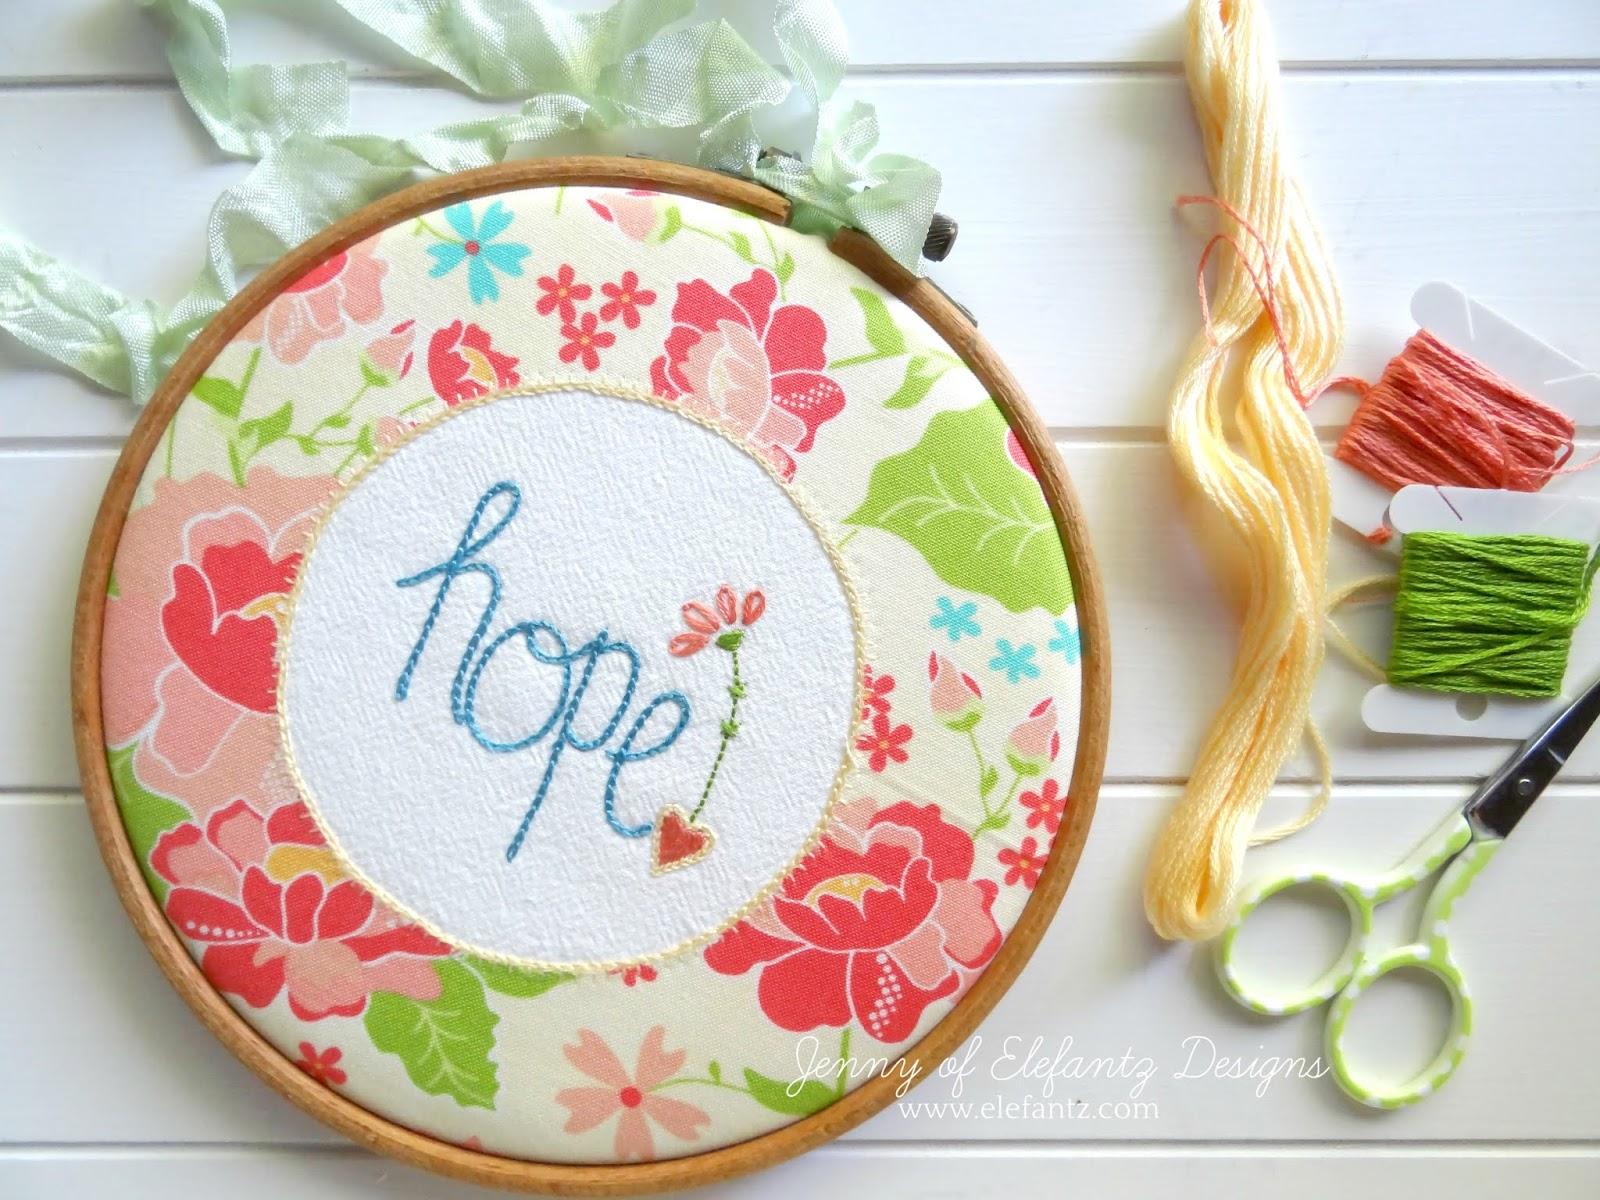 Jenny of ELEFANTZ: HOPE (free pattern)